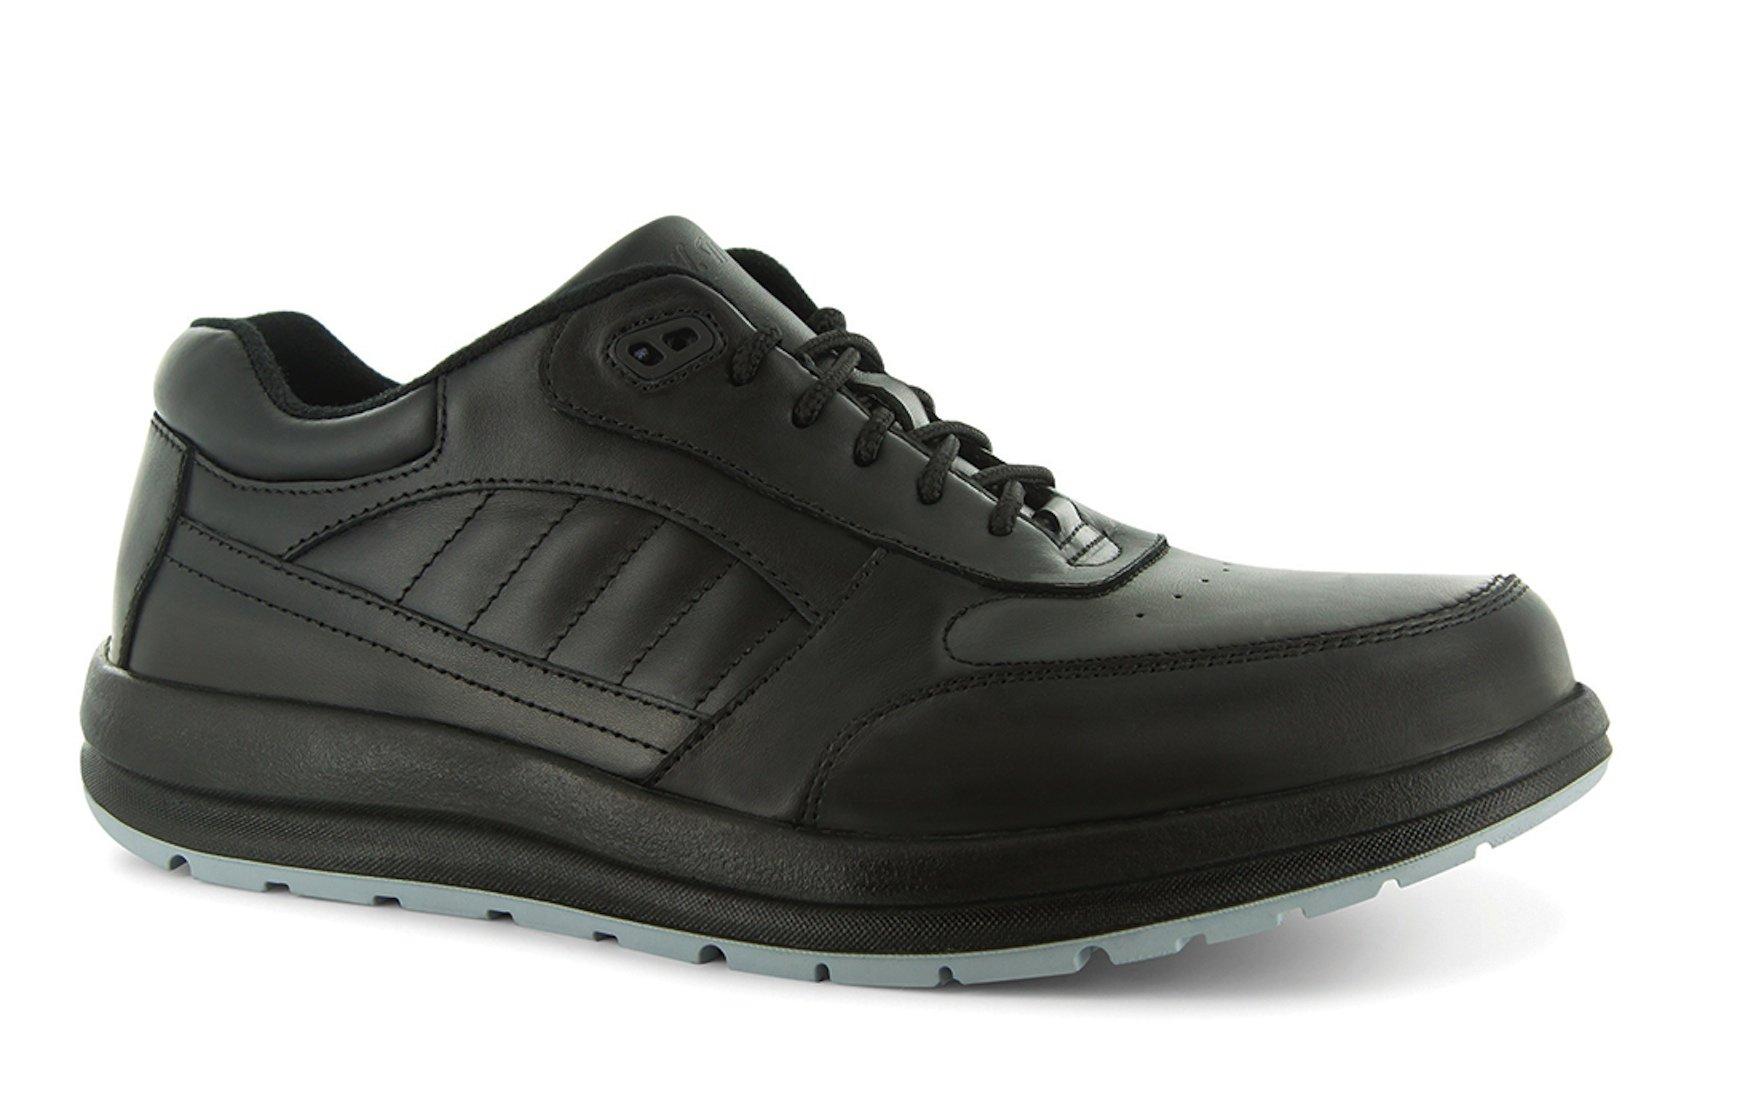 P W Minor Performance Walker Men's Therapeutic Casual Extra Depth Shoe: Black 7.5 Medium (D) Lace